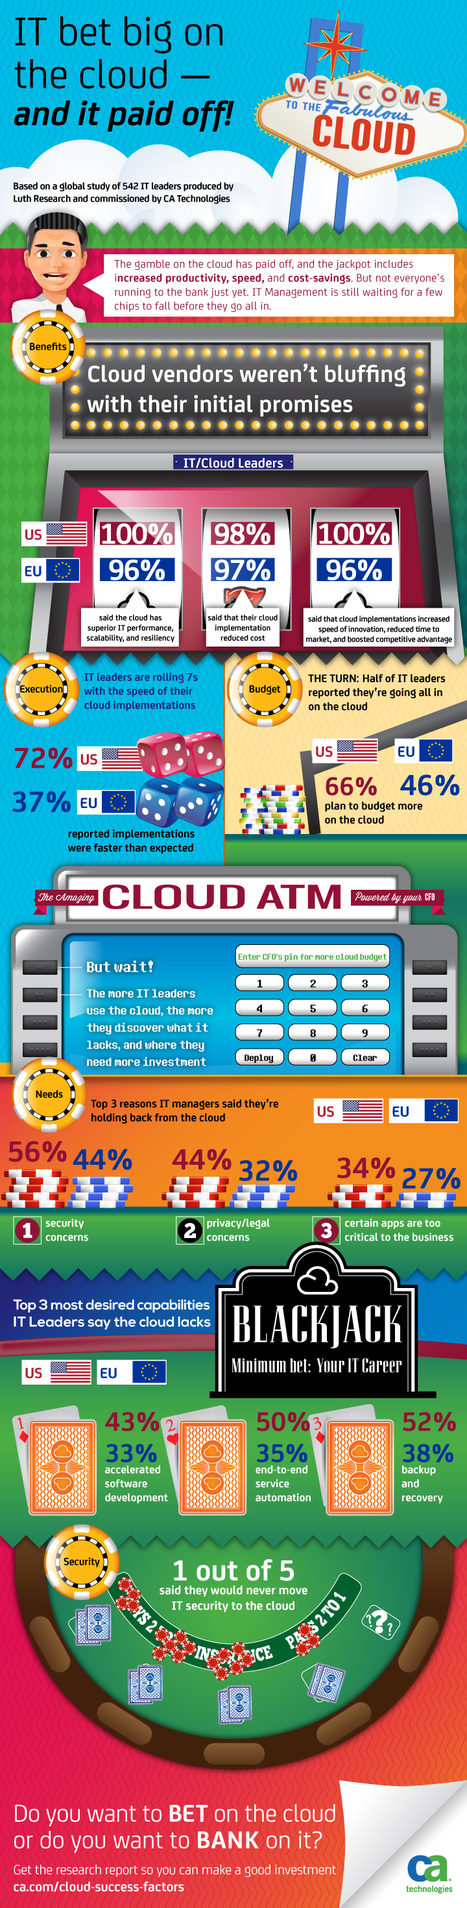 INFOGRAPHIC: The Amazing Cloud ATM | Cloud Central | Scoop.it